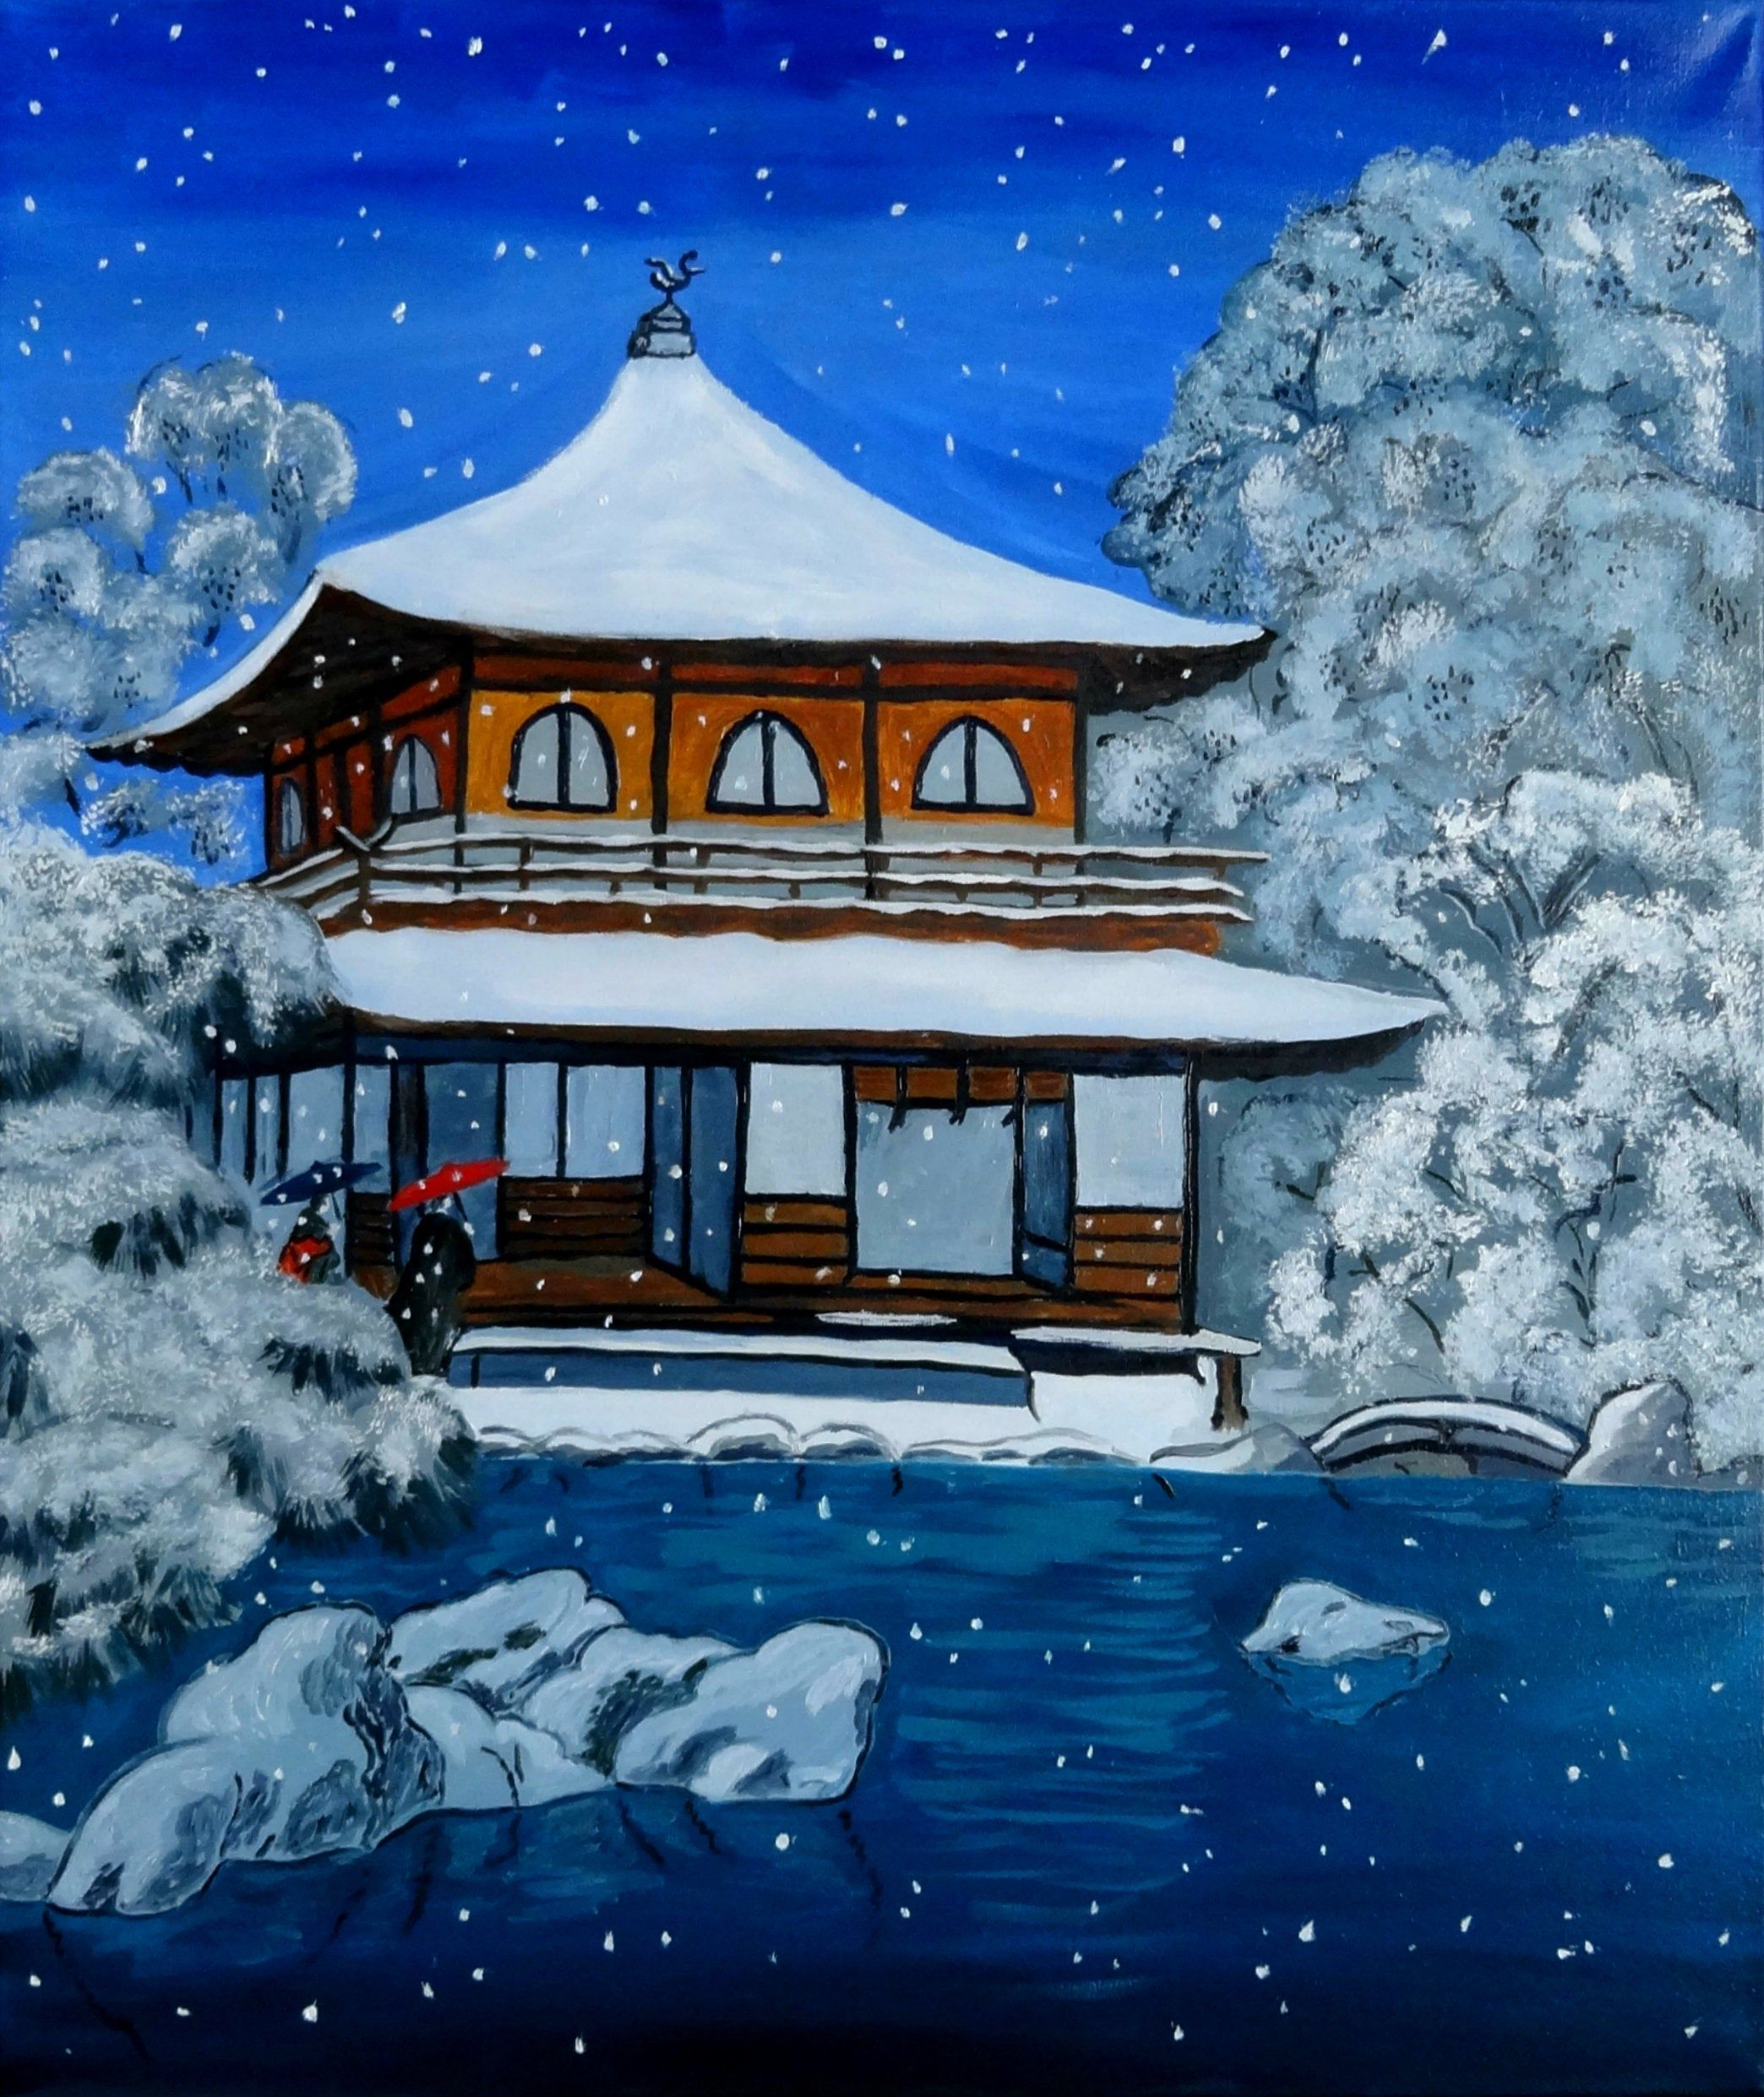 Japanese Painting Original Art Winter Painting Japan Landscape Etsy Japan Painting Japanese Painting Japan Landscape